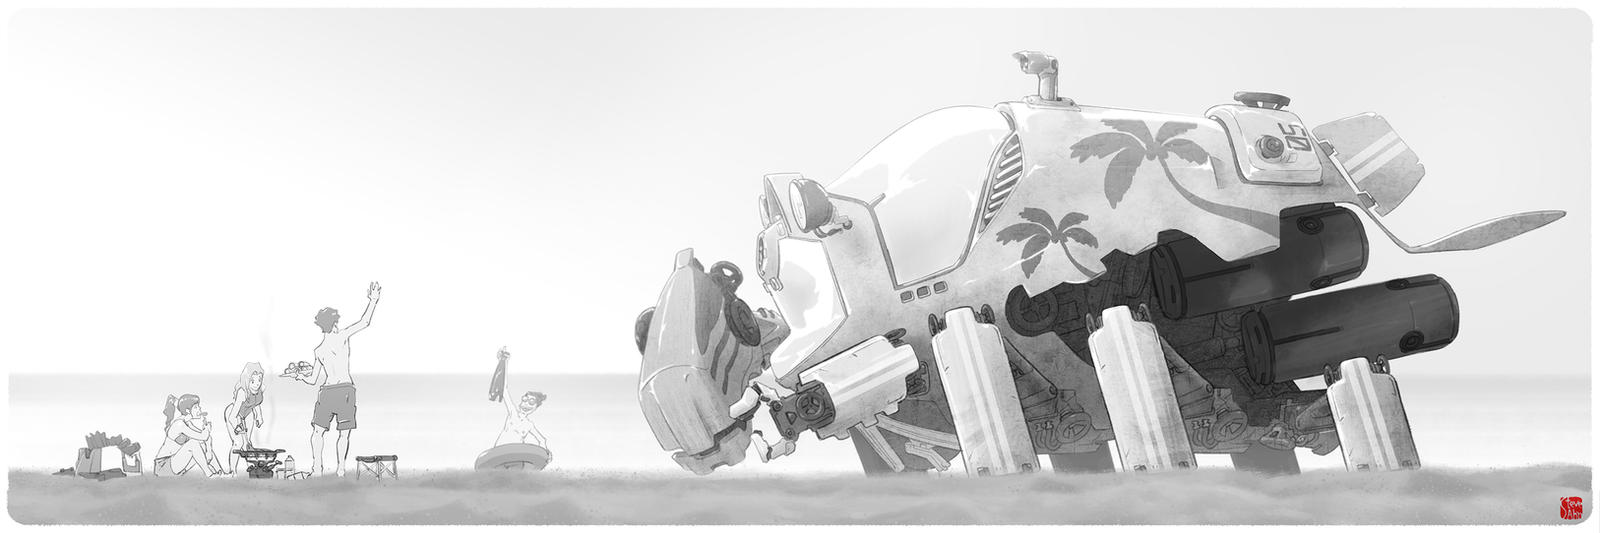 Sub-Mechrine#05 by SteveAhn